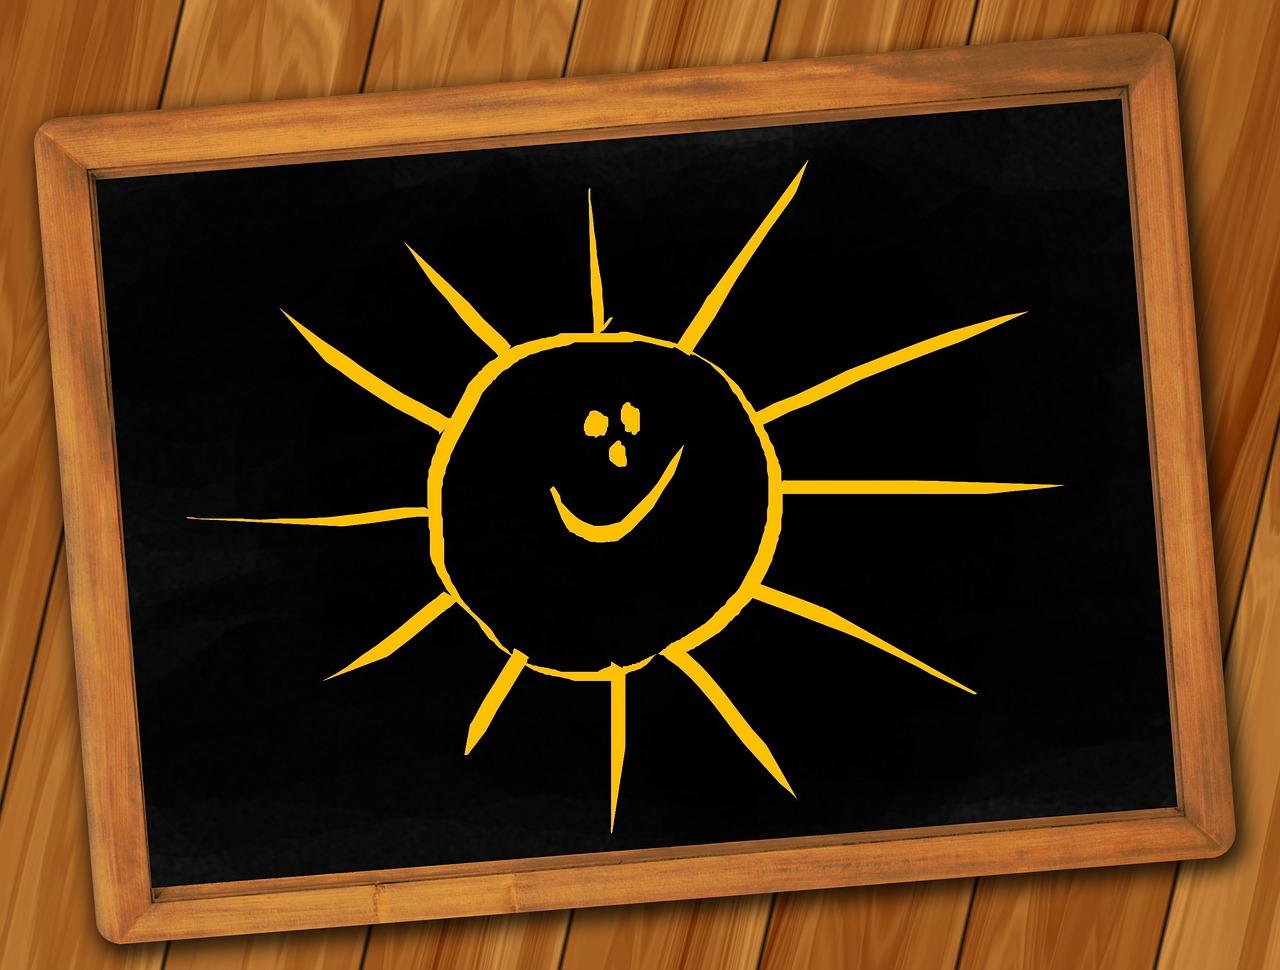 board-142741_1280.jpg